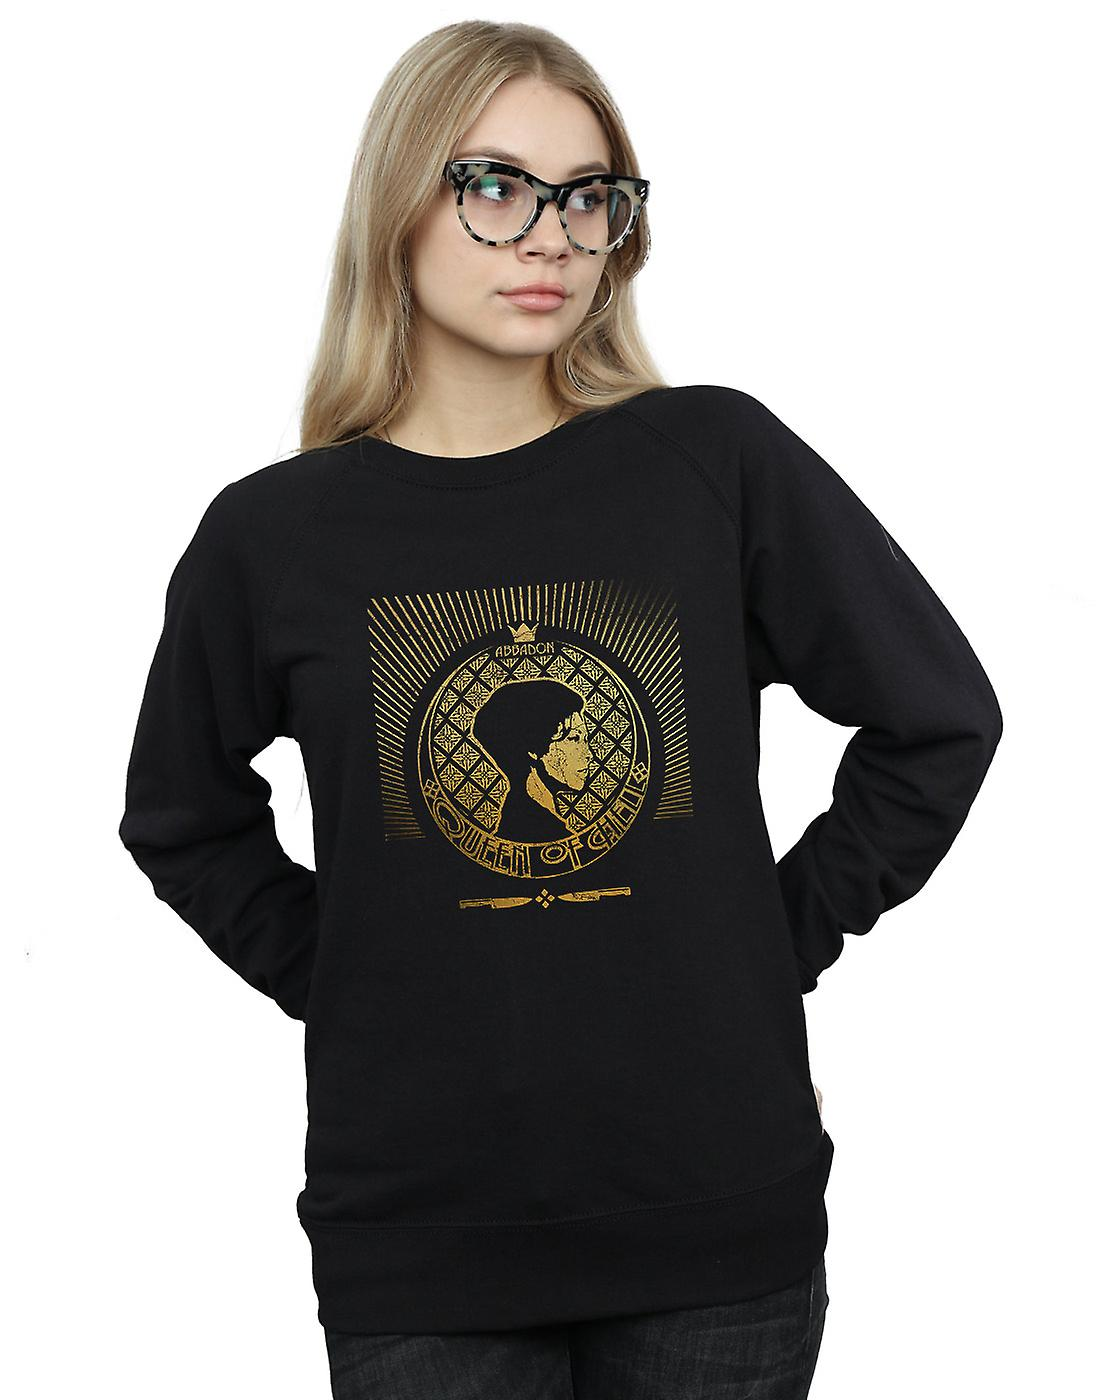 Supernatural Women's Abbadon Crest Sweatshirt